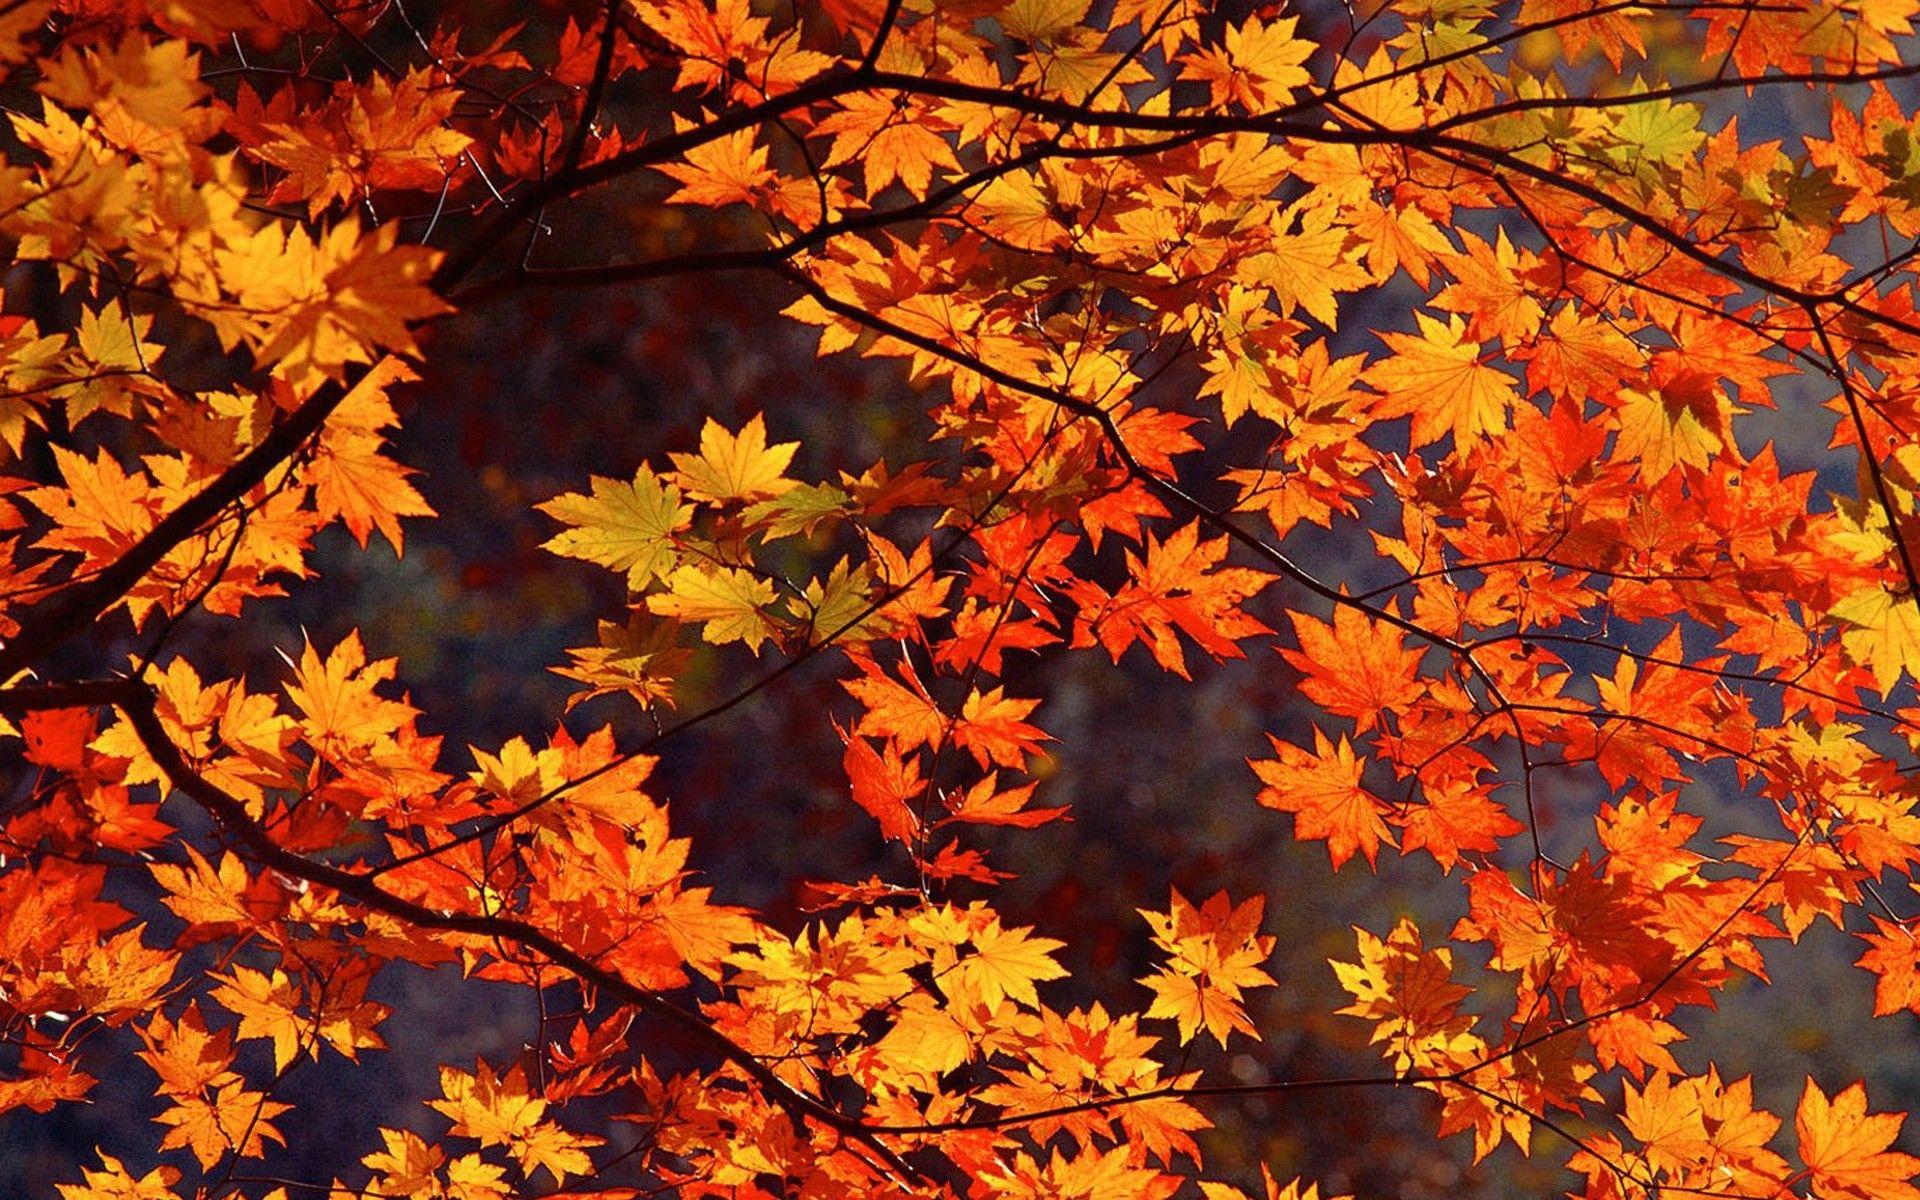 Japan Autumn Wallpaper Free Fall Wallpaper Fall Wallpaper Autumn Leaves Wallpaper